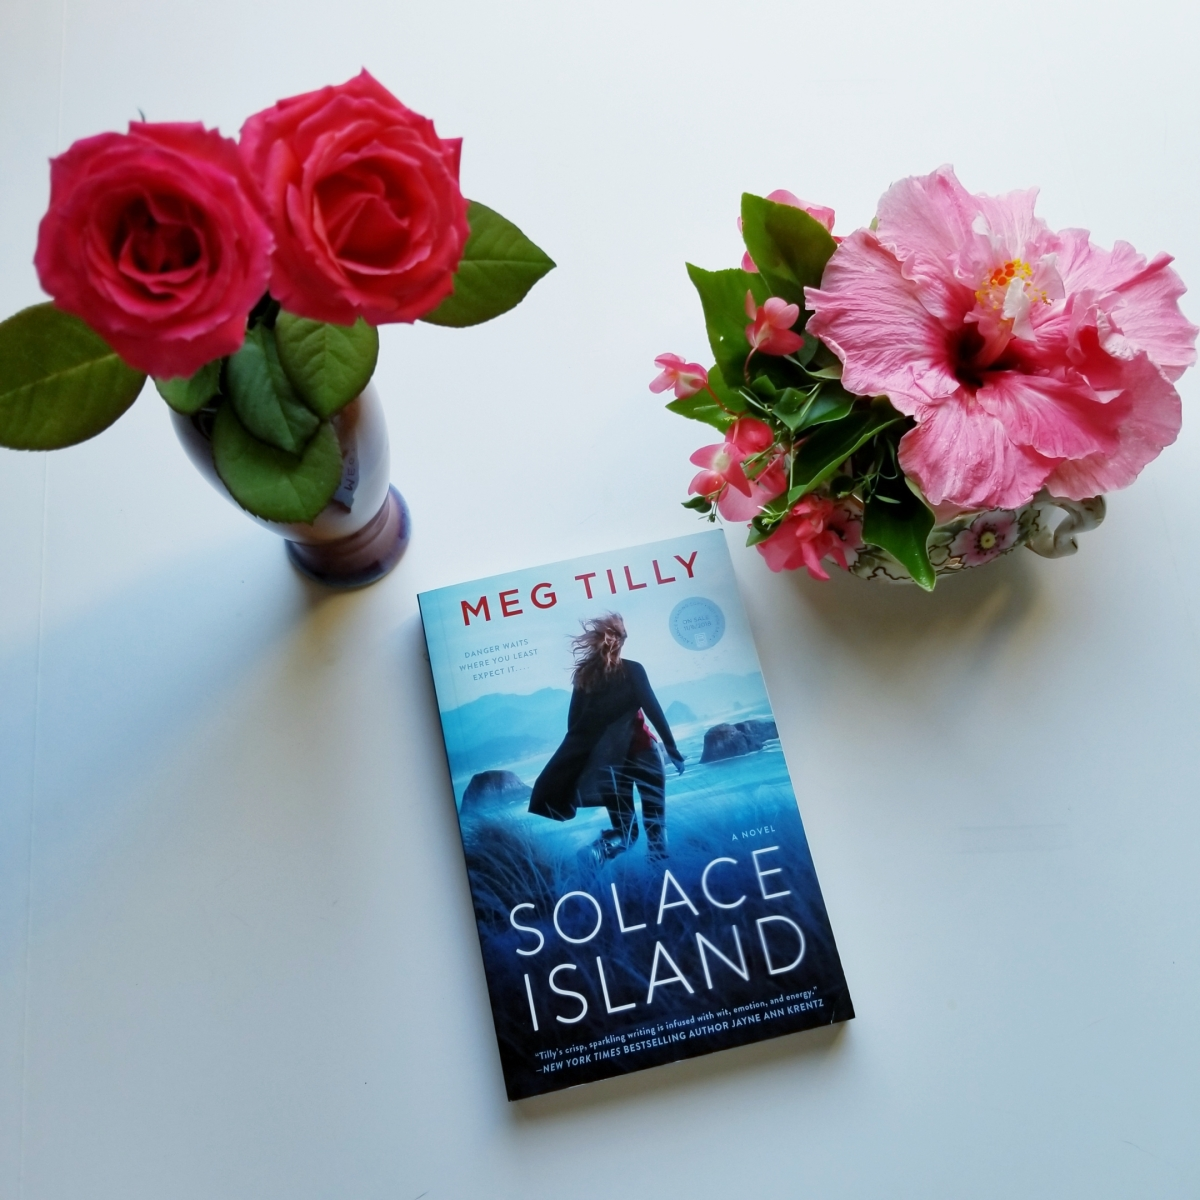 Solace Island by Meg Tilley #bookreview #tarheelreader #thrsolace @meggamonstah @berkleypub #solaceisland #6bookbestiessolaceisland